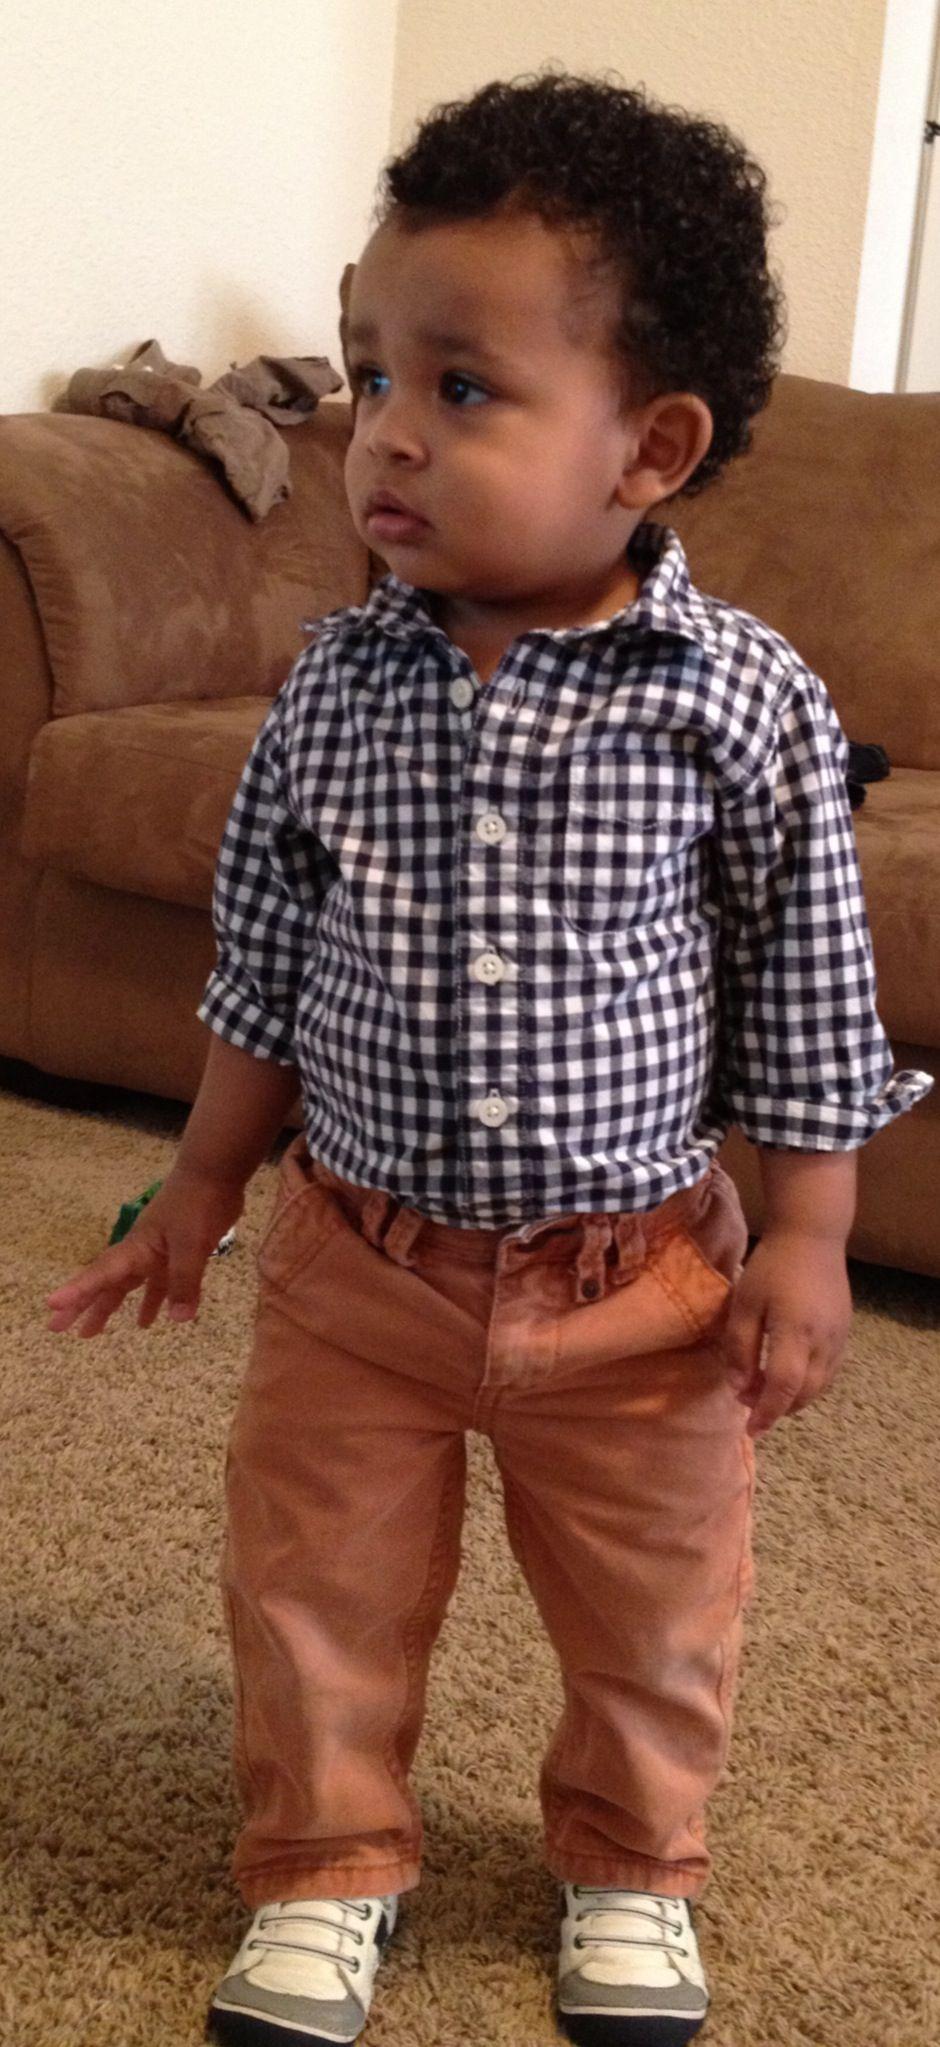 JT in church clothes  Boys church outfit, Kids fashion, Baby fashion